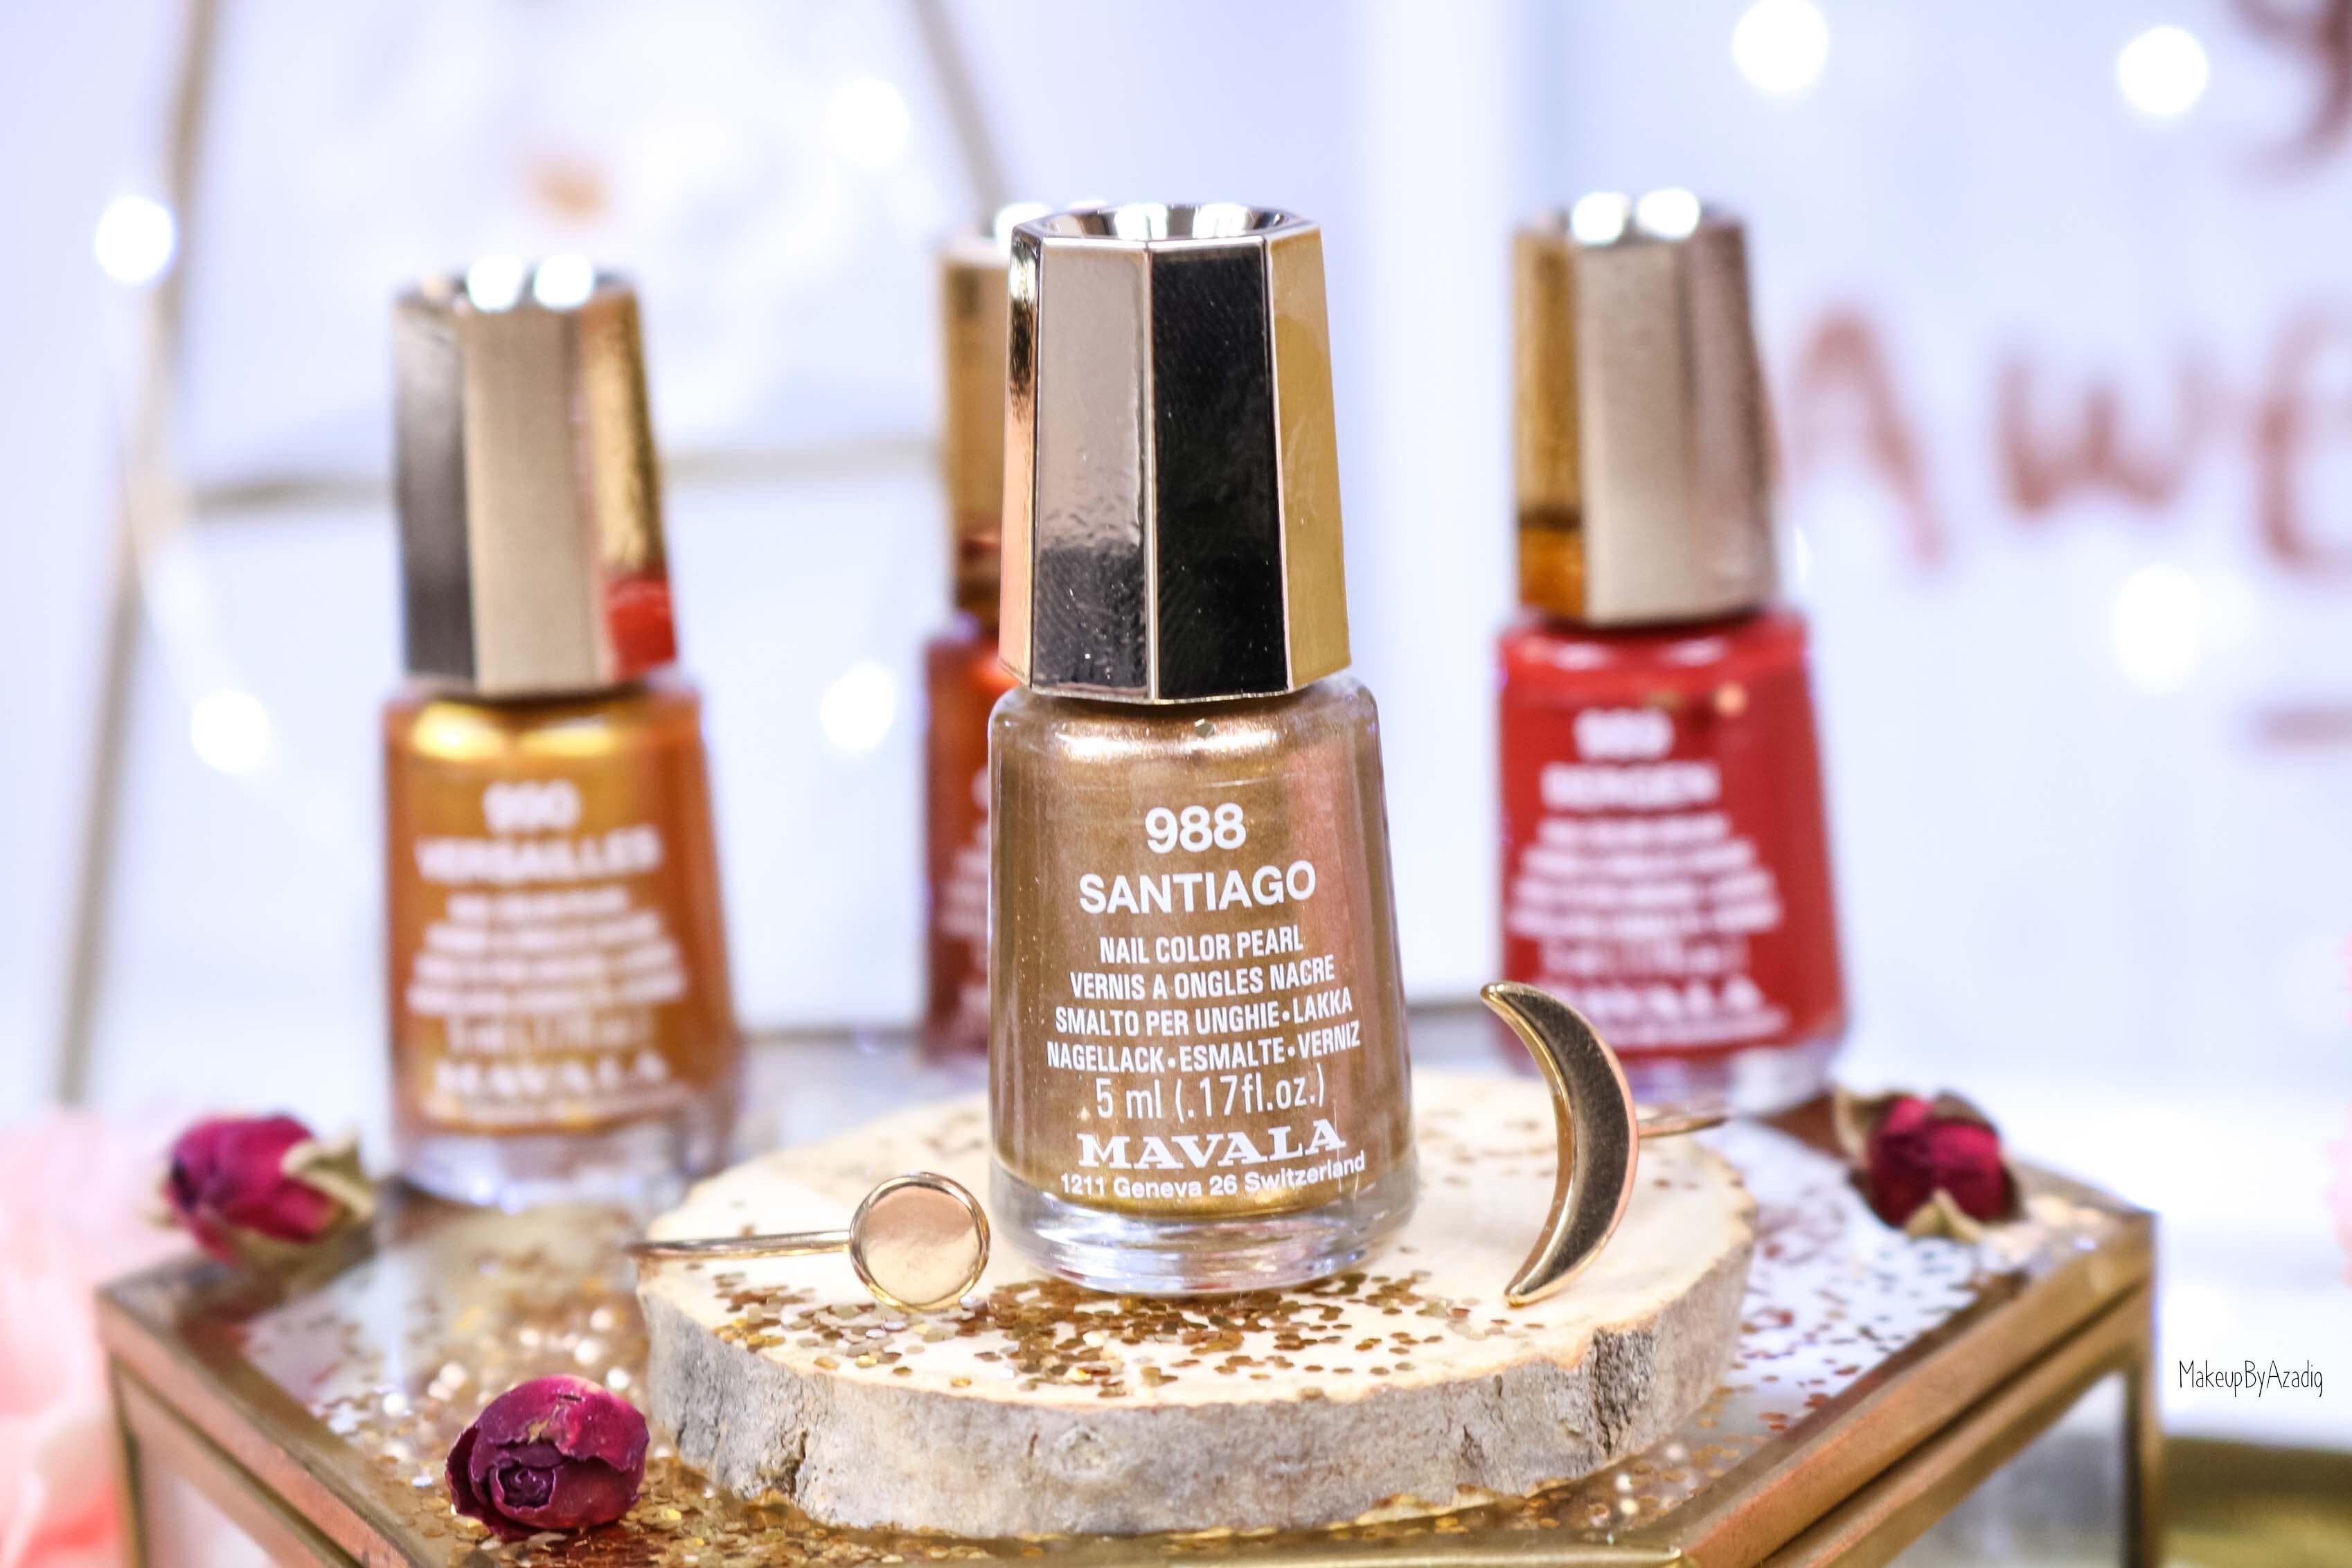 revue-collection-vernis-mavala-nails-heritage-chic-bordeaux-cuivre-metallique-gold-rouge-makeupbyazadig-swatch-avis-prix-santiago